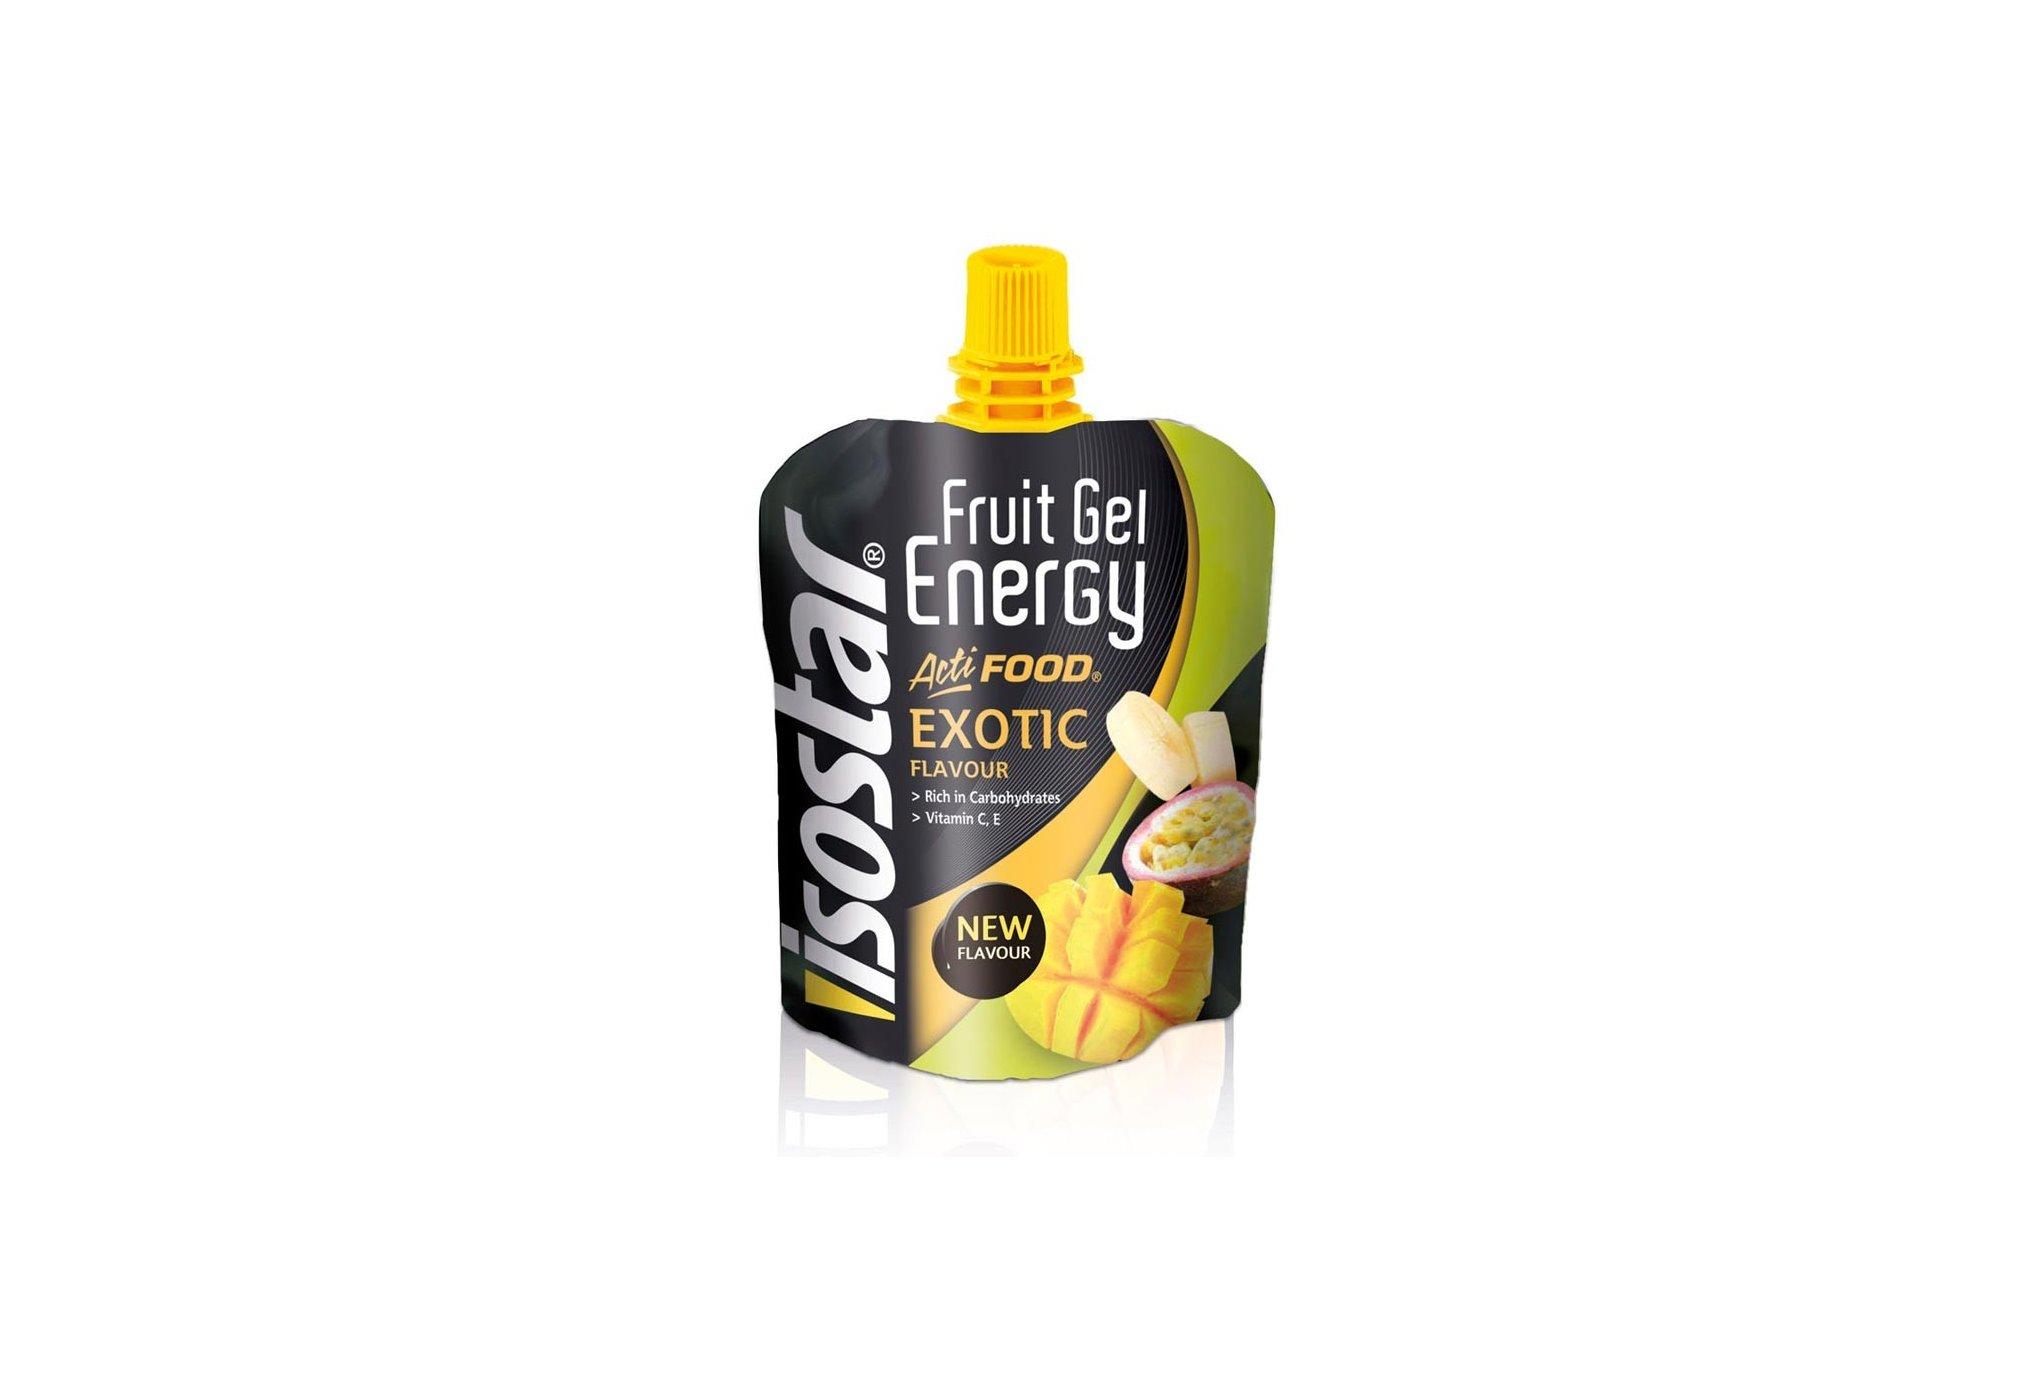 Isostar Gel Energy Actifood - Fruits Exotiques Diététique Gels